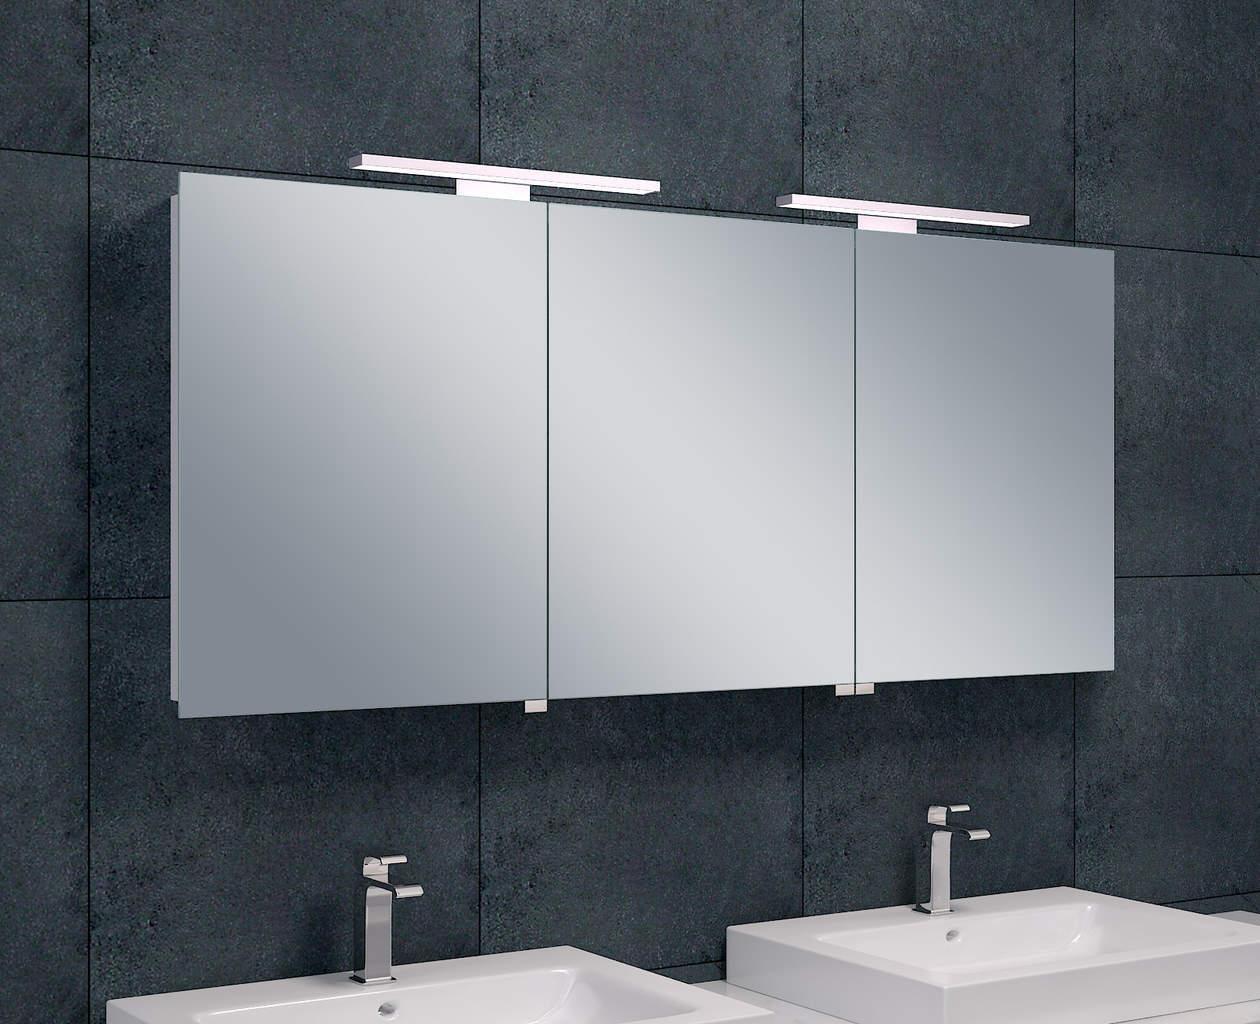 luxe spiegelkast led verlichting 140x60x14cm megadump. Black Bedroom Furniture Sets. Home Design Ideas